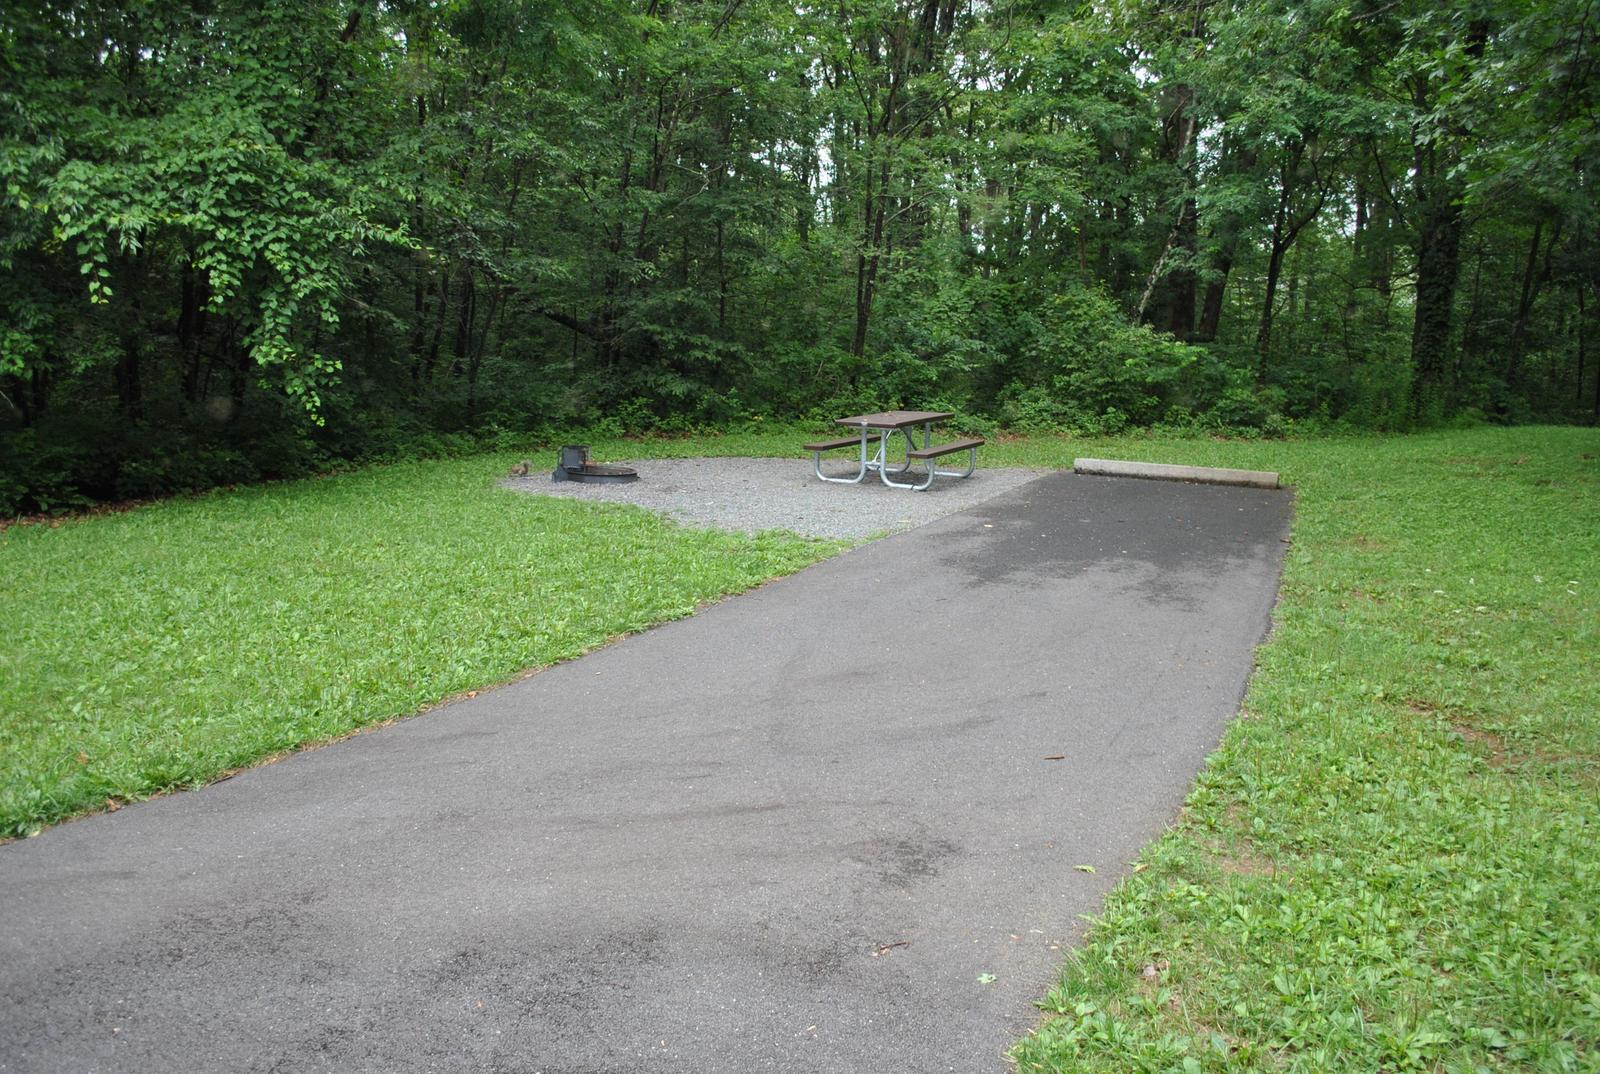 Mathews Arm Campground – Site A106